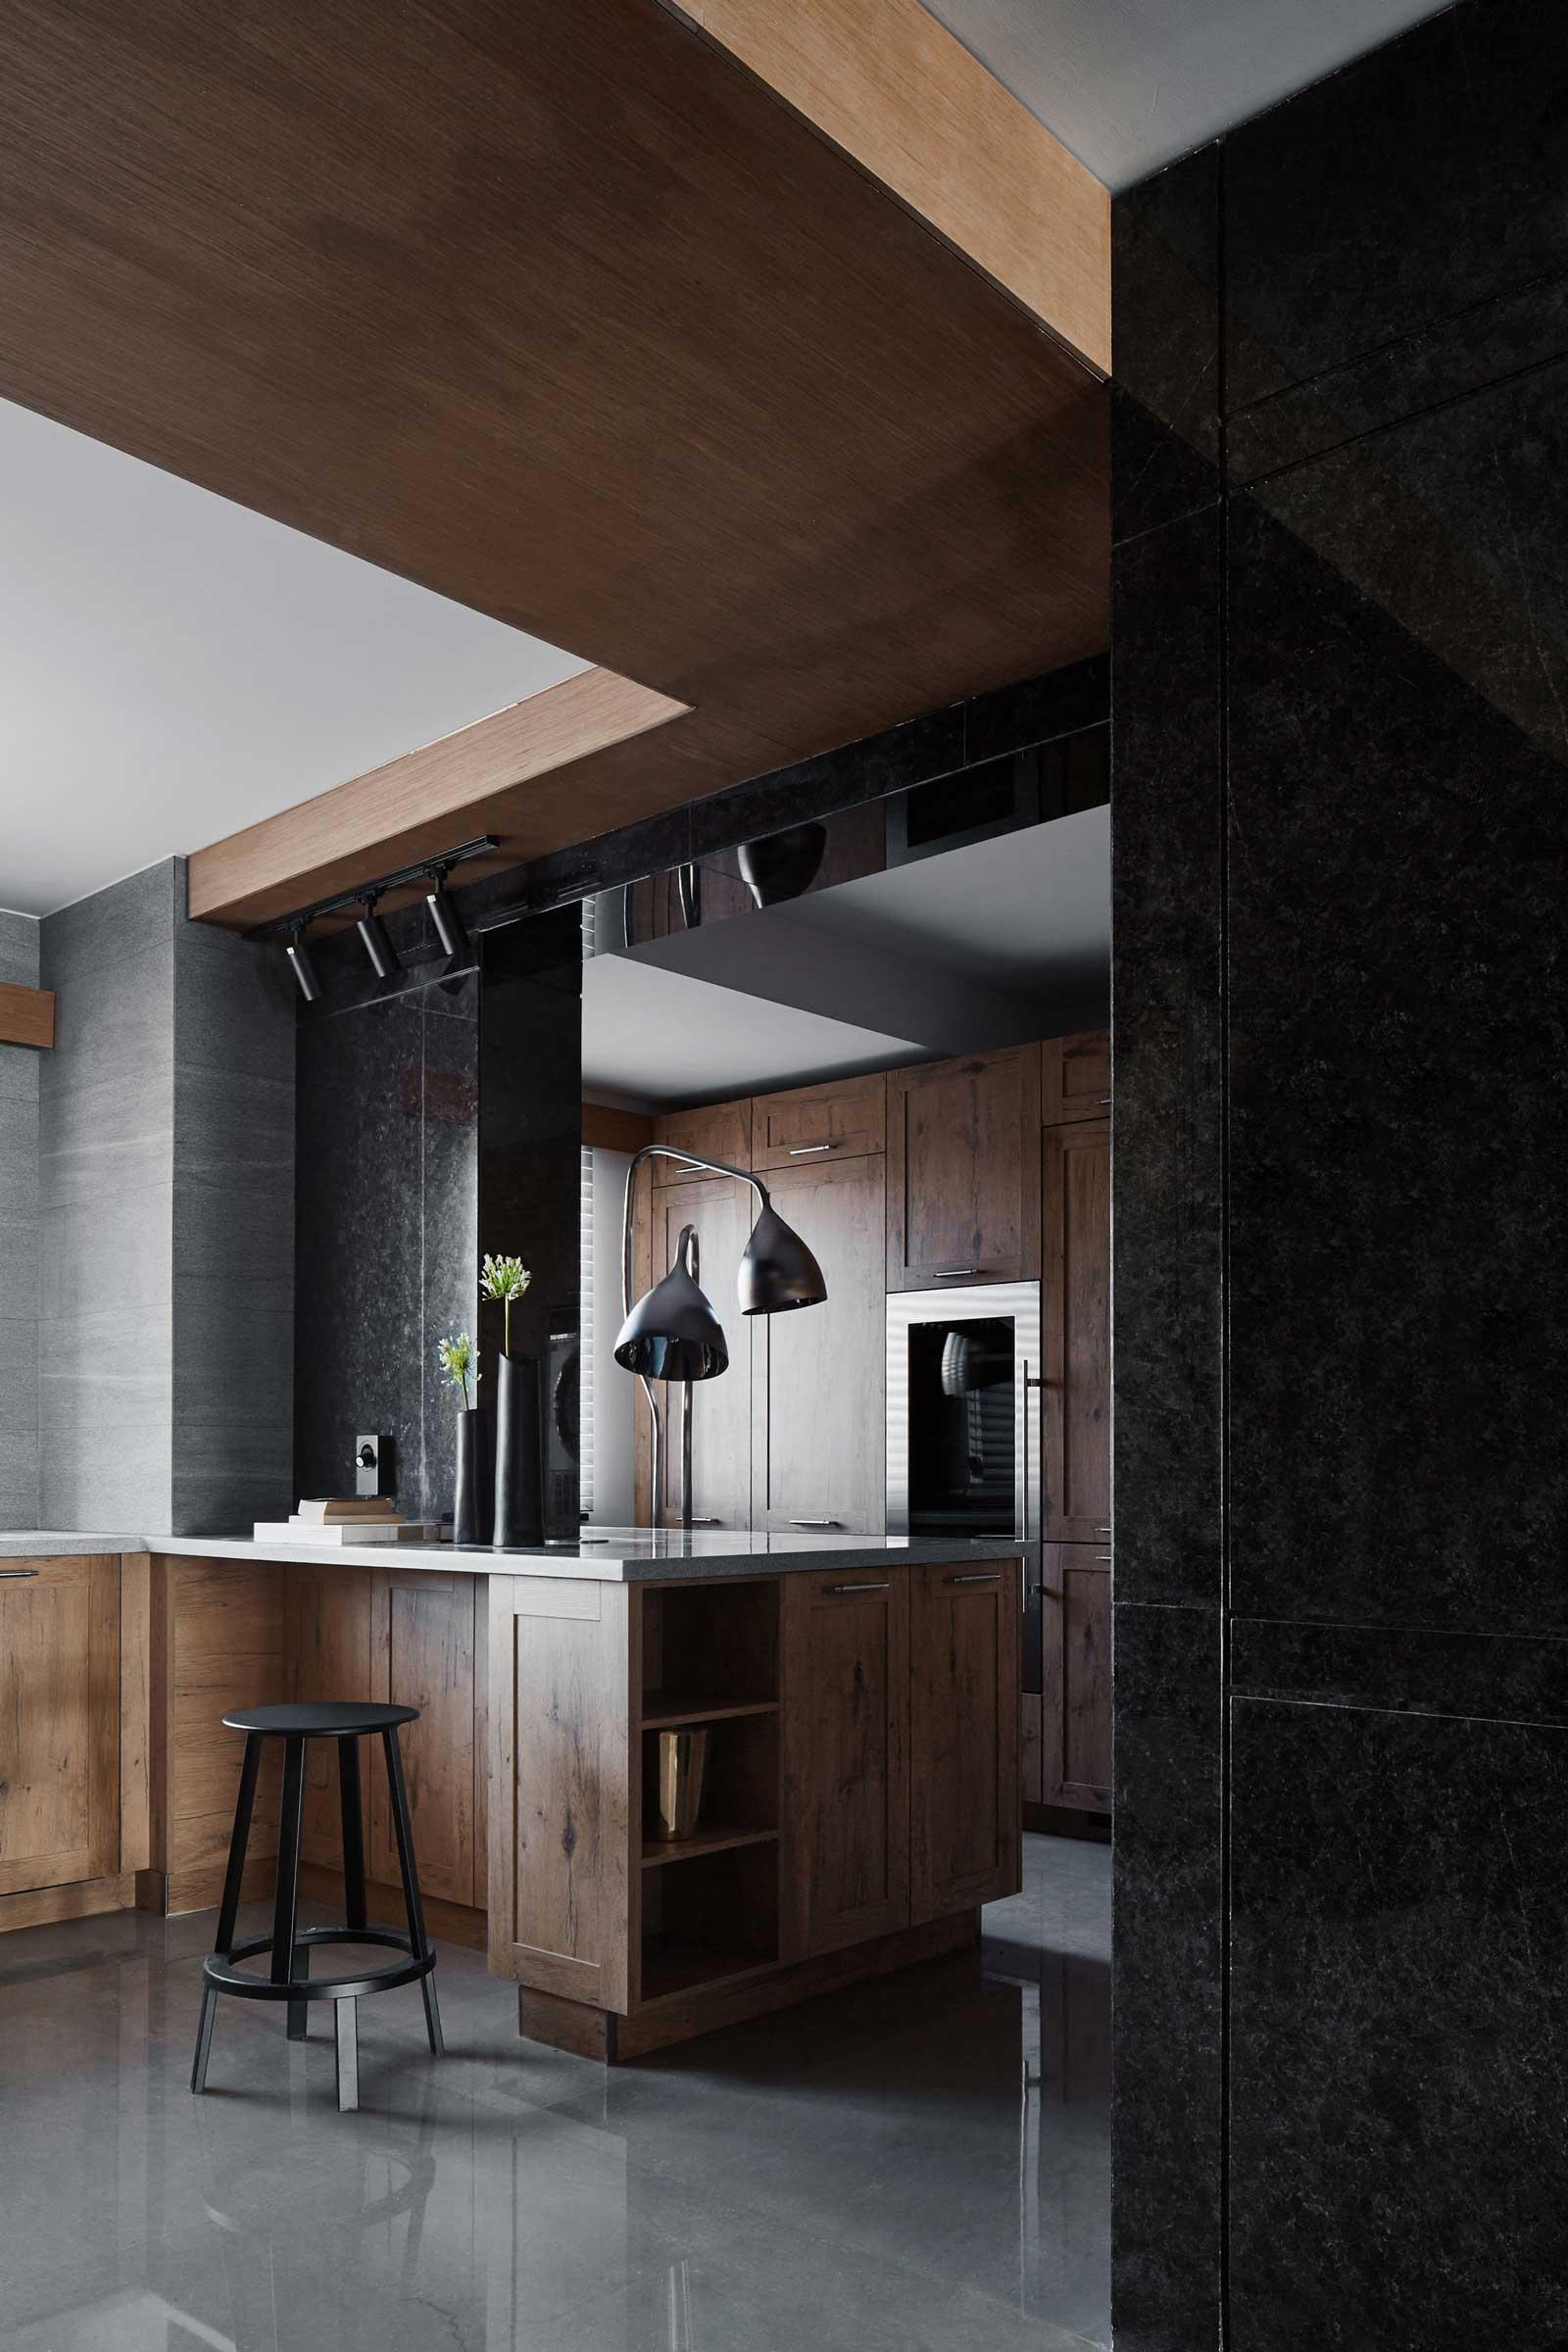 lane-house-ARCHISTRY-nolan-chao-10-kitchen.jpg